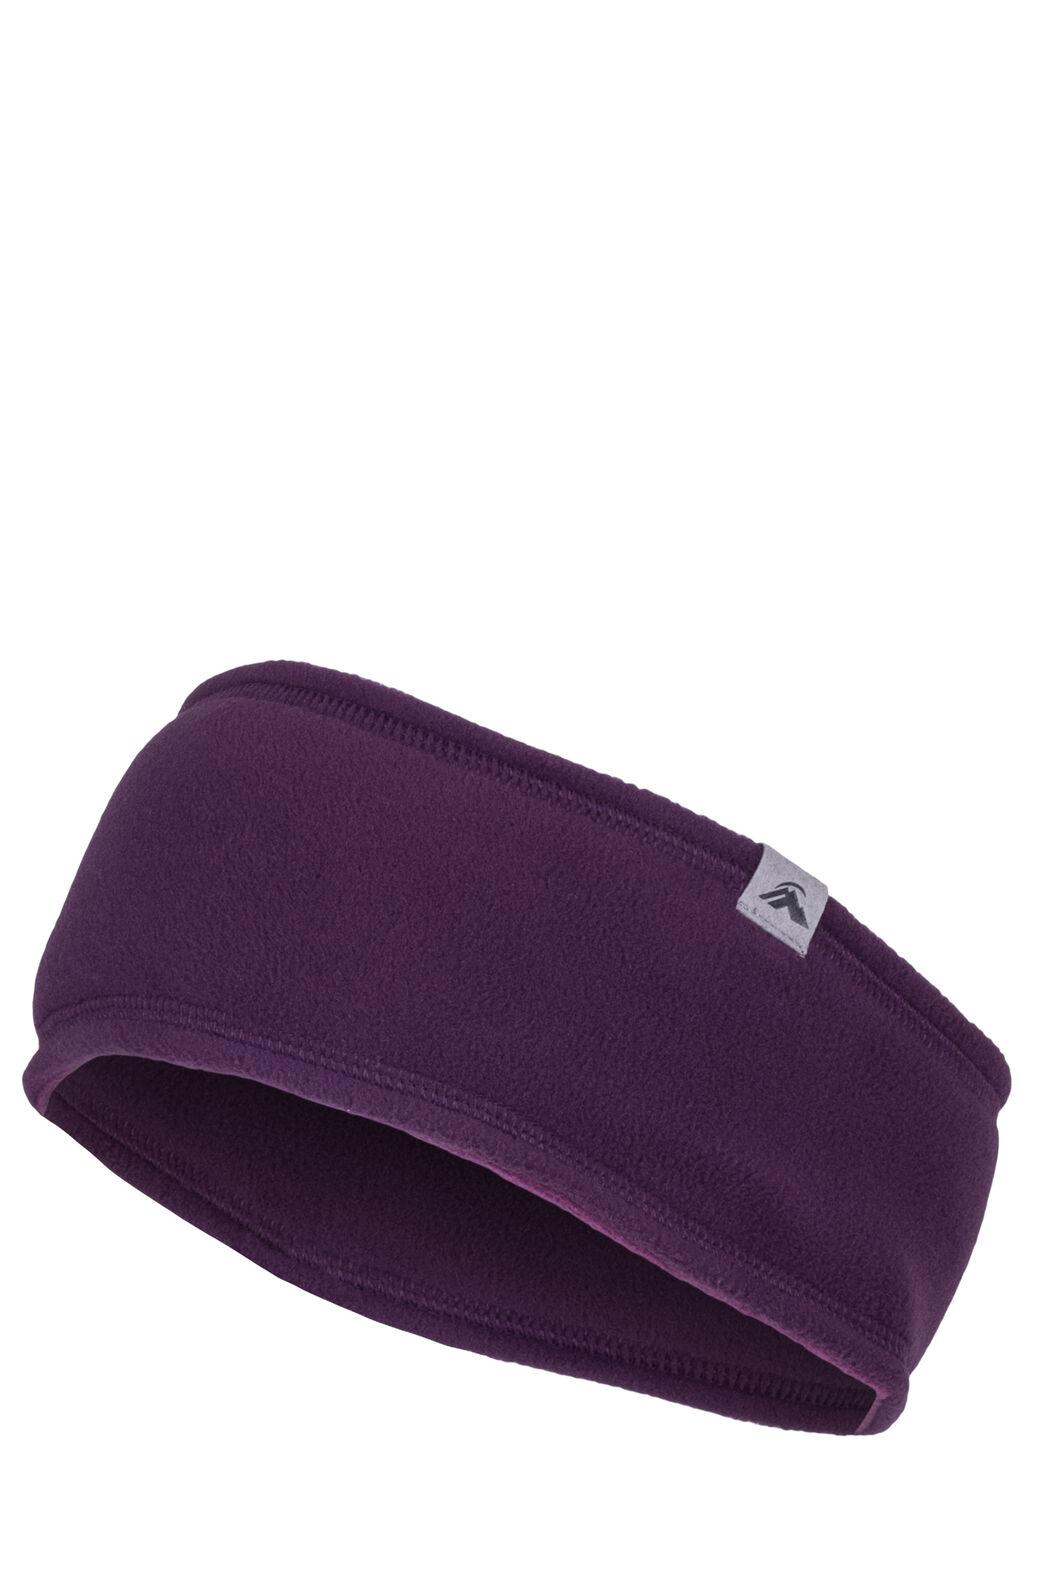 Macpac Tieke Headband, Magenta, hi-res